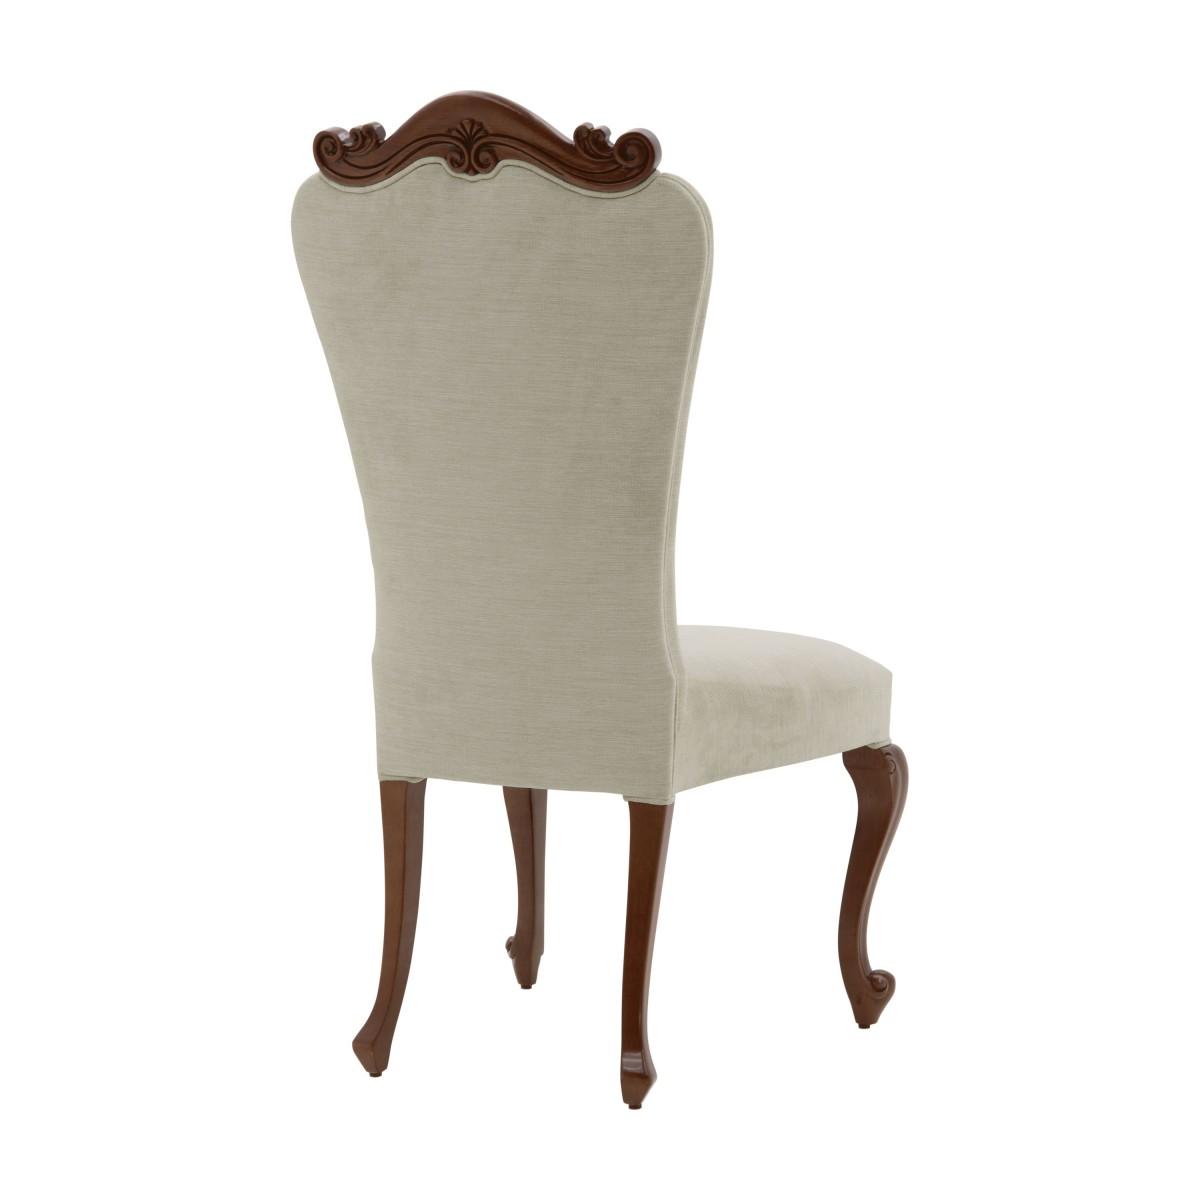 Chair Grazia - Sevensedie